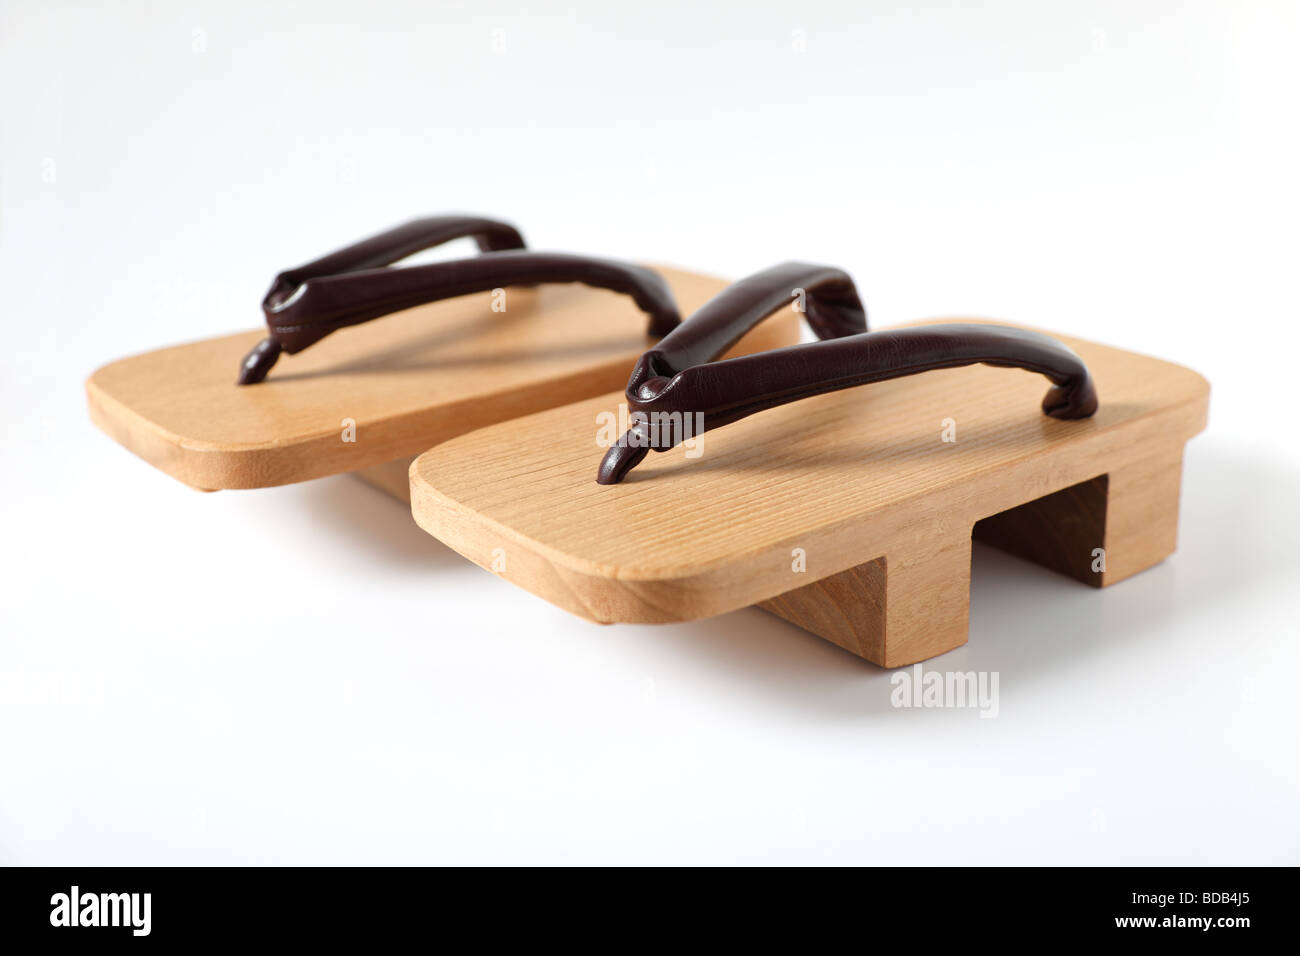 Japanese Wooden Sandals High Resolution